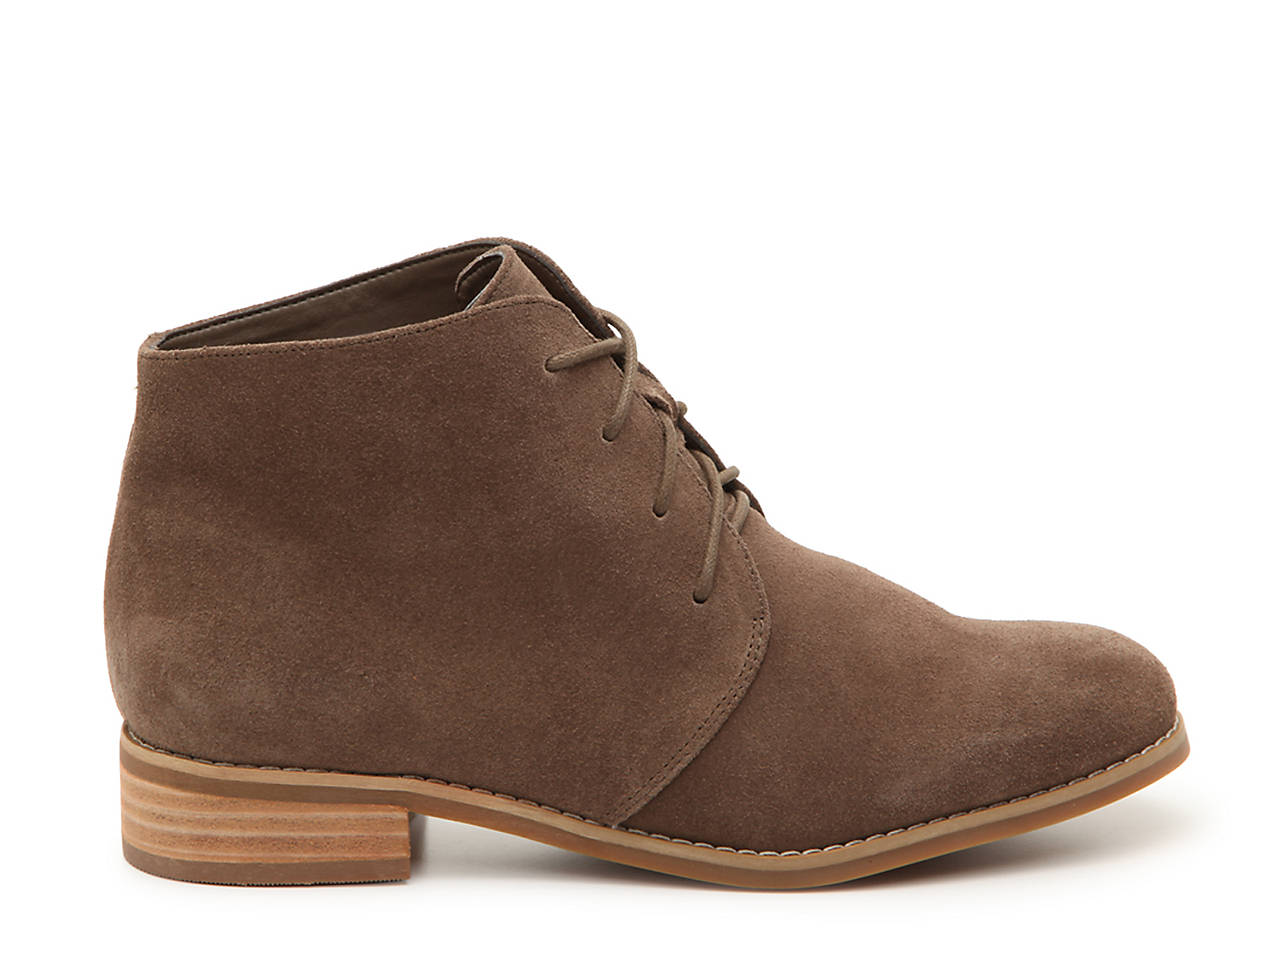 8bafe5d2f013 Blondo Rayann Waterproof Chukka Boot Women s Shoes